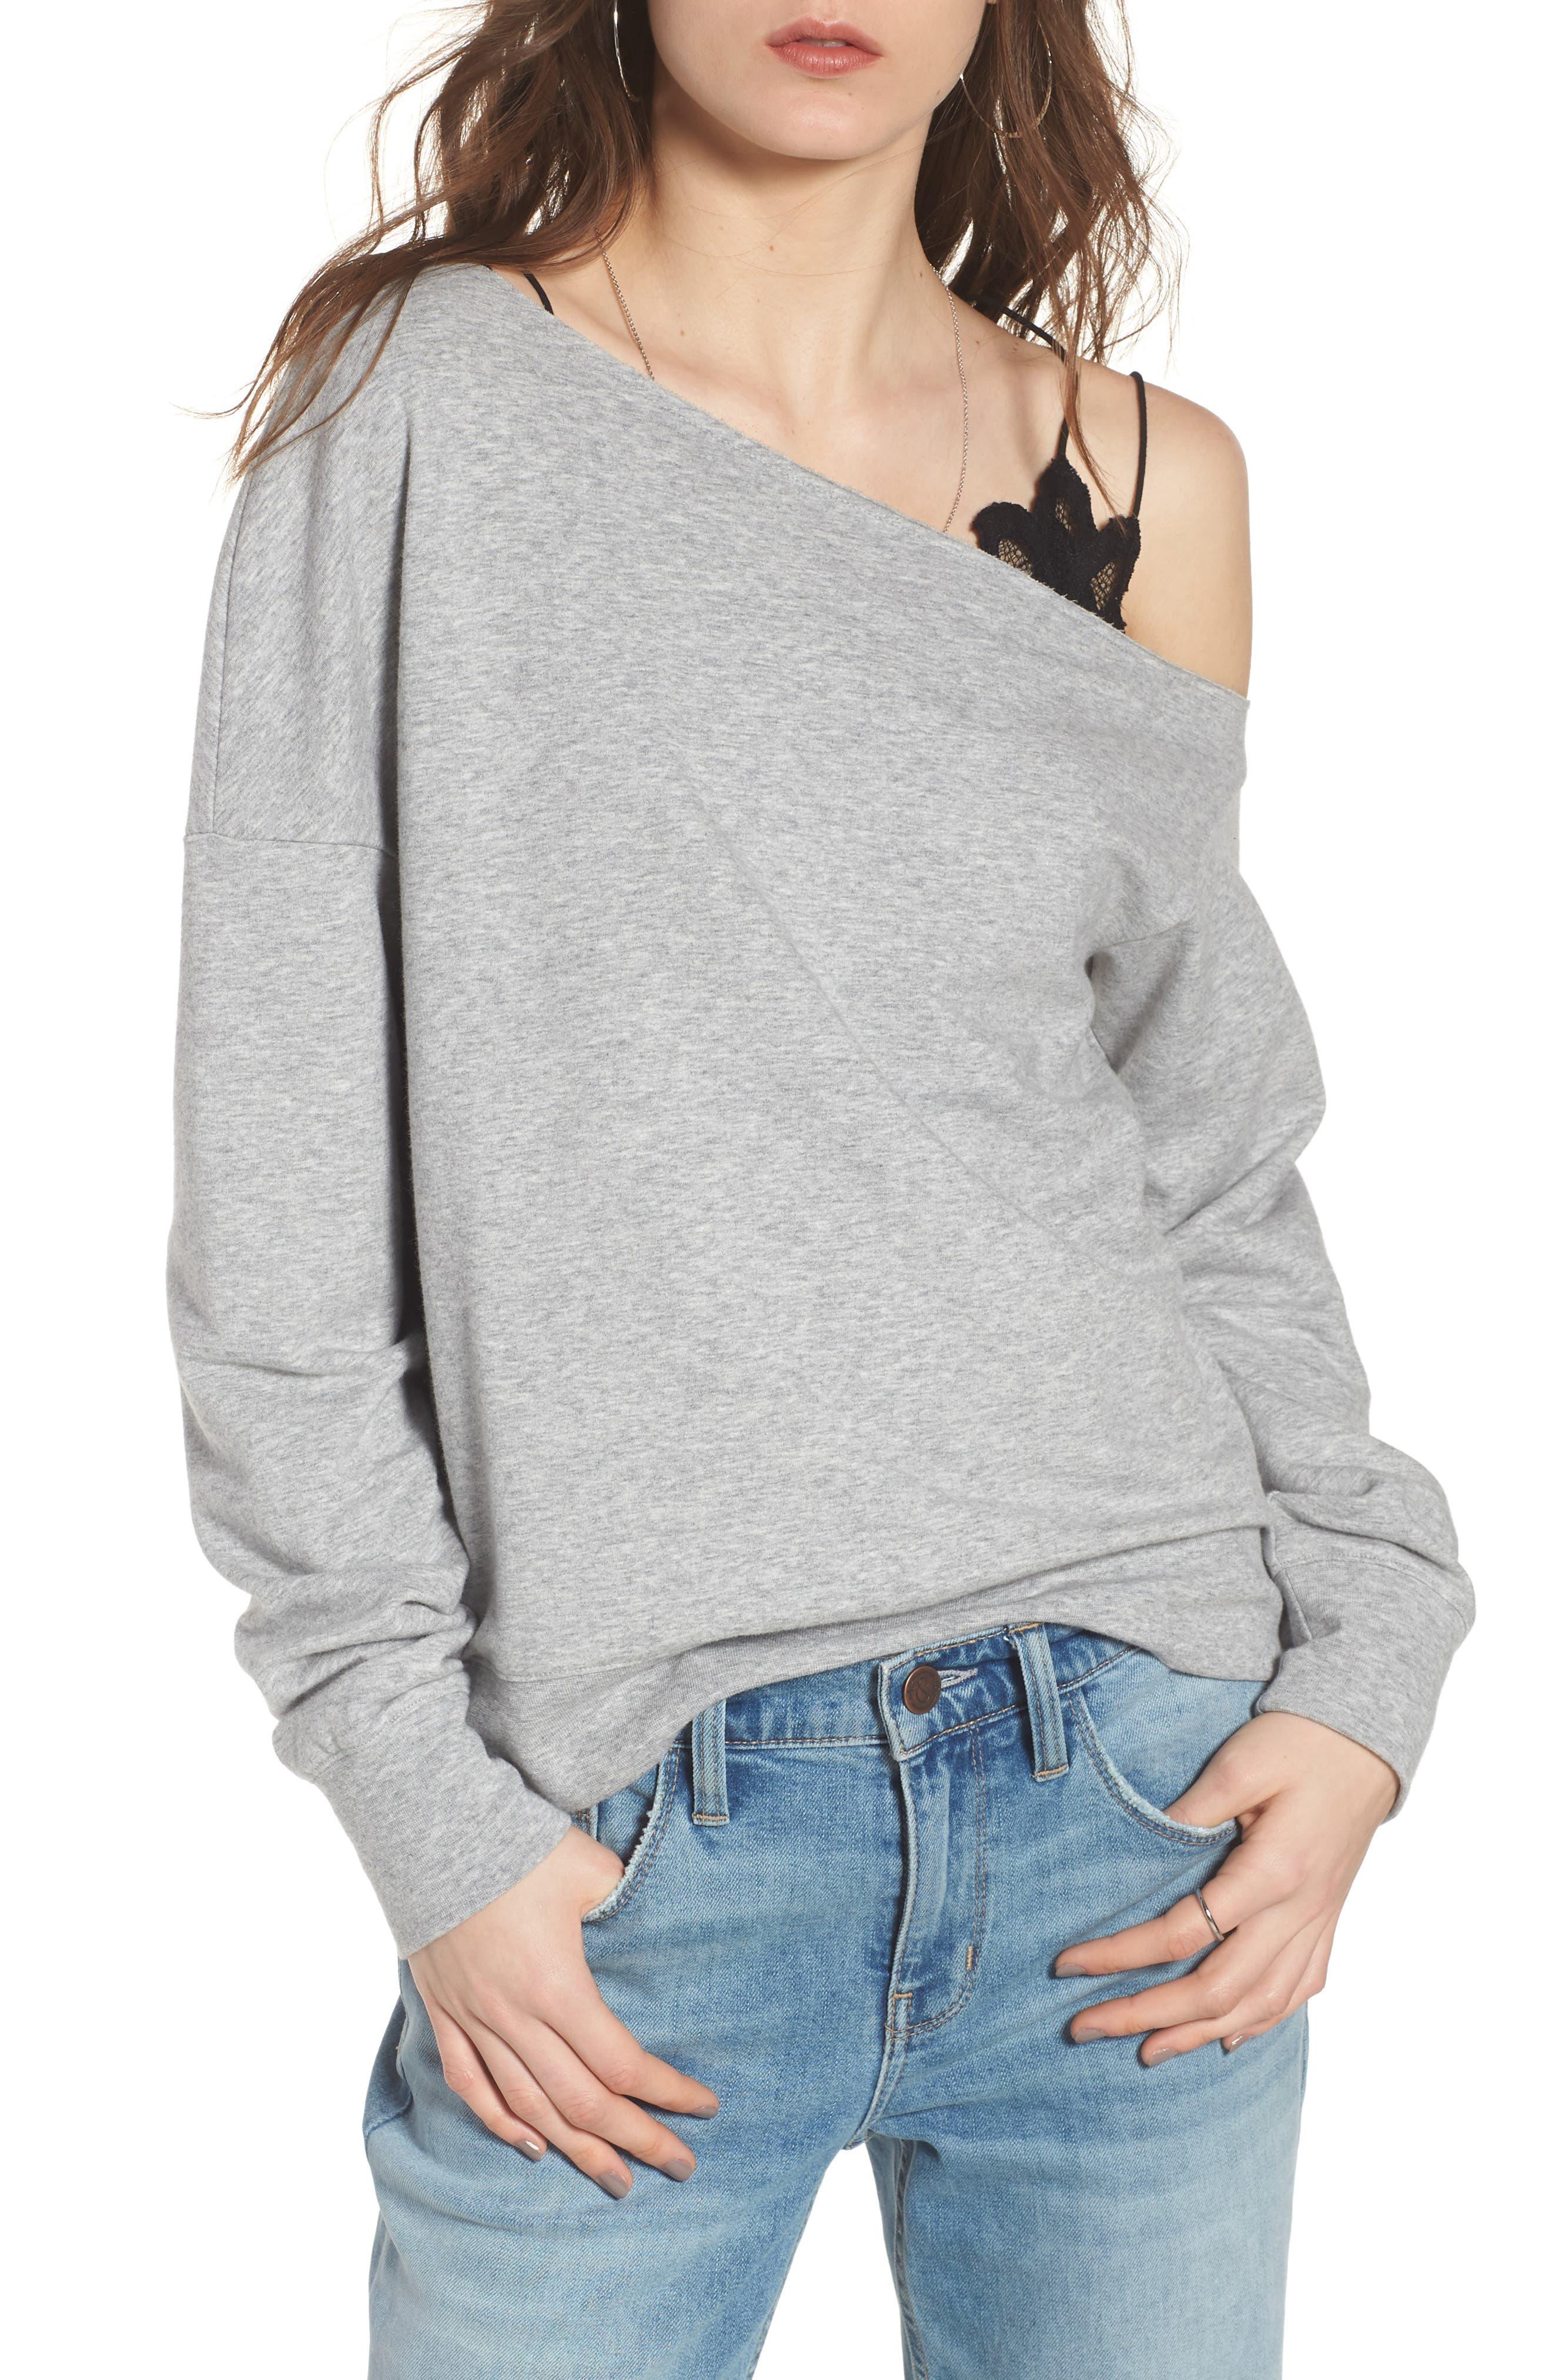 Treasure & Bond Asymmetrical Sweatshirt